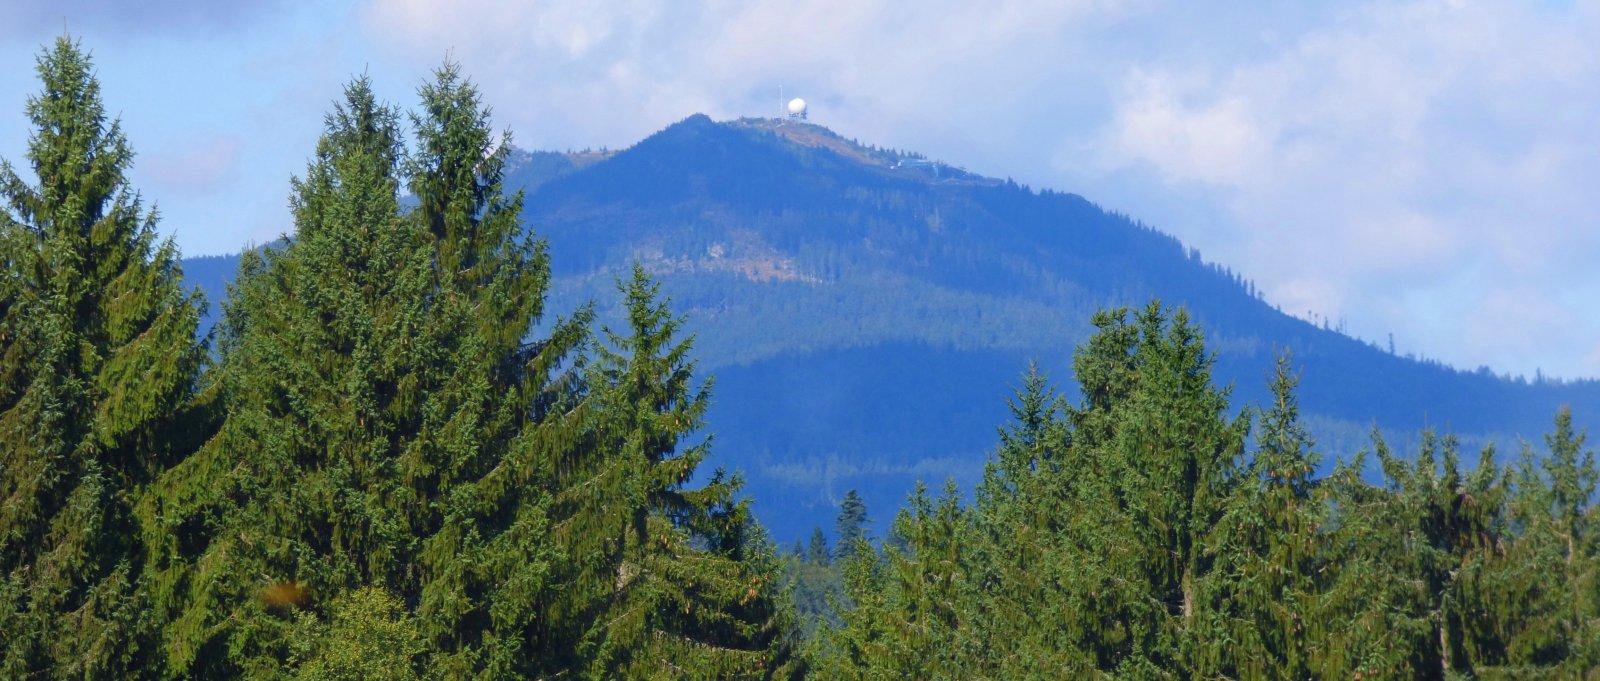 jutta-breitbild-ausflugsziele-bayerischer-wald-arber-berg-highlights-1600